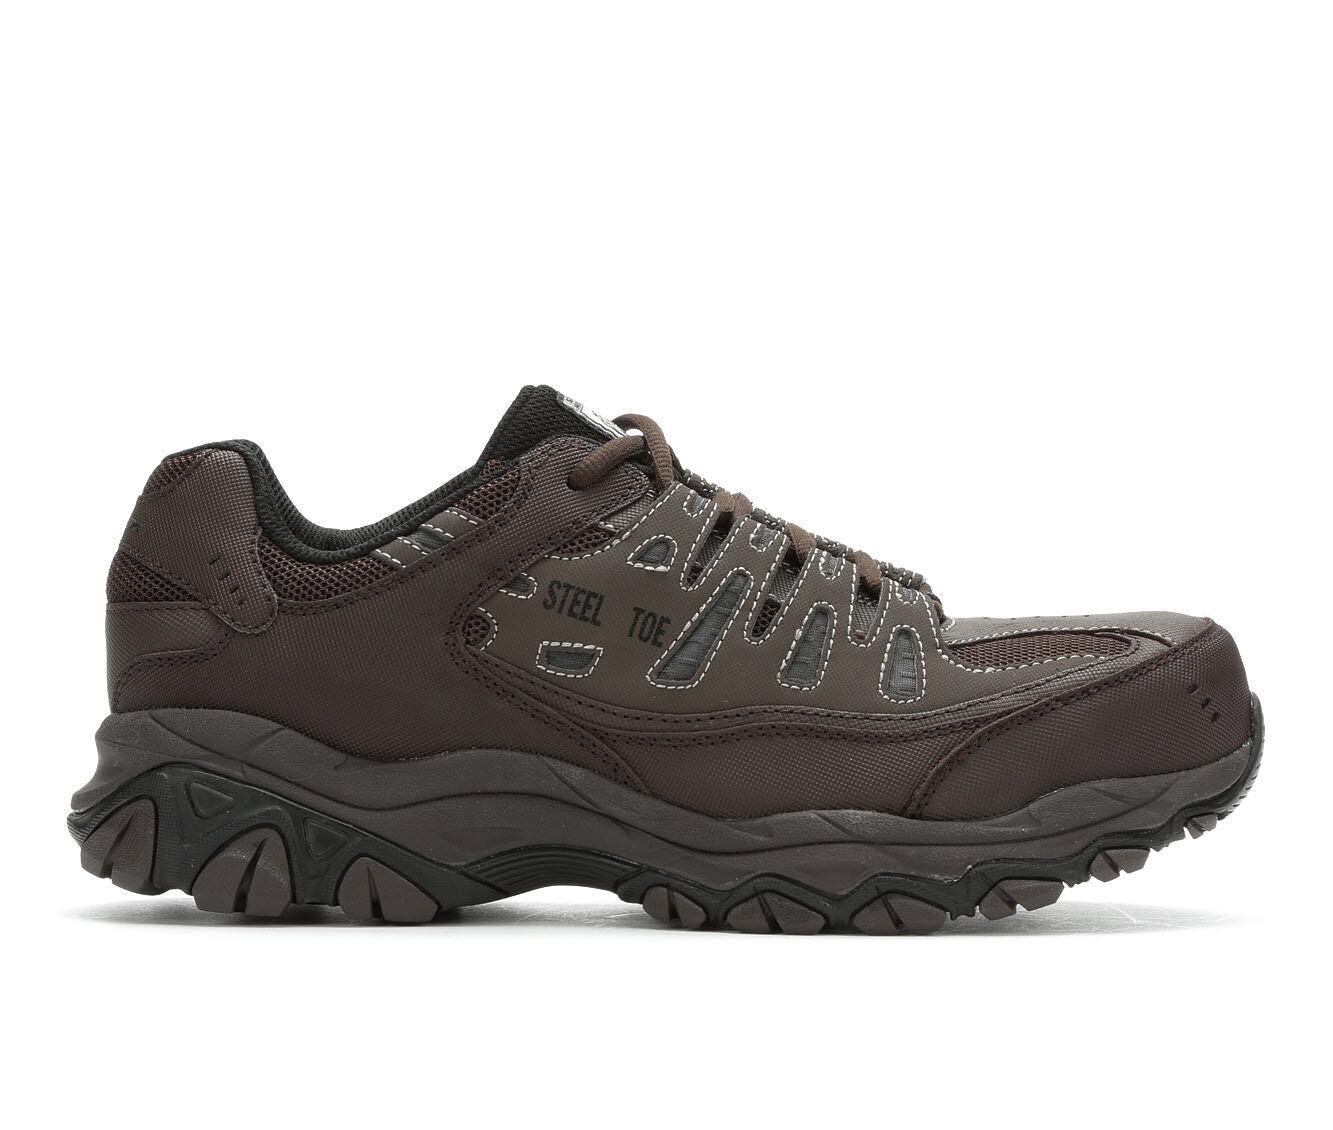 Men's Skechers Work 77055 Cankton Steel Toe Work Shoes Brown